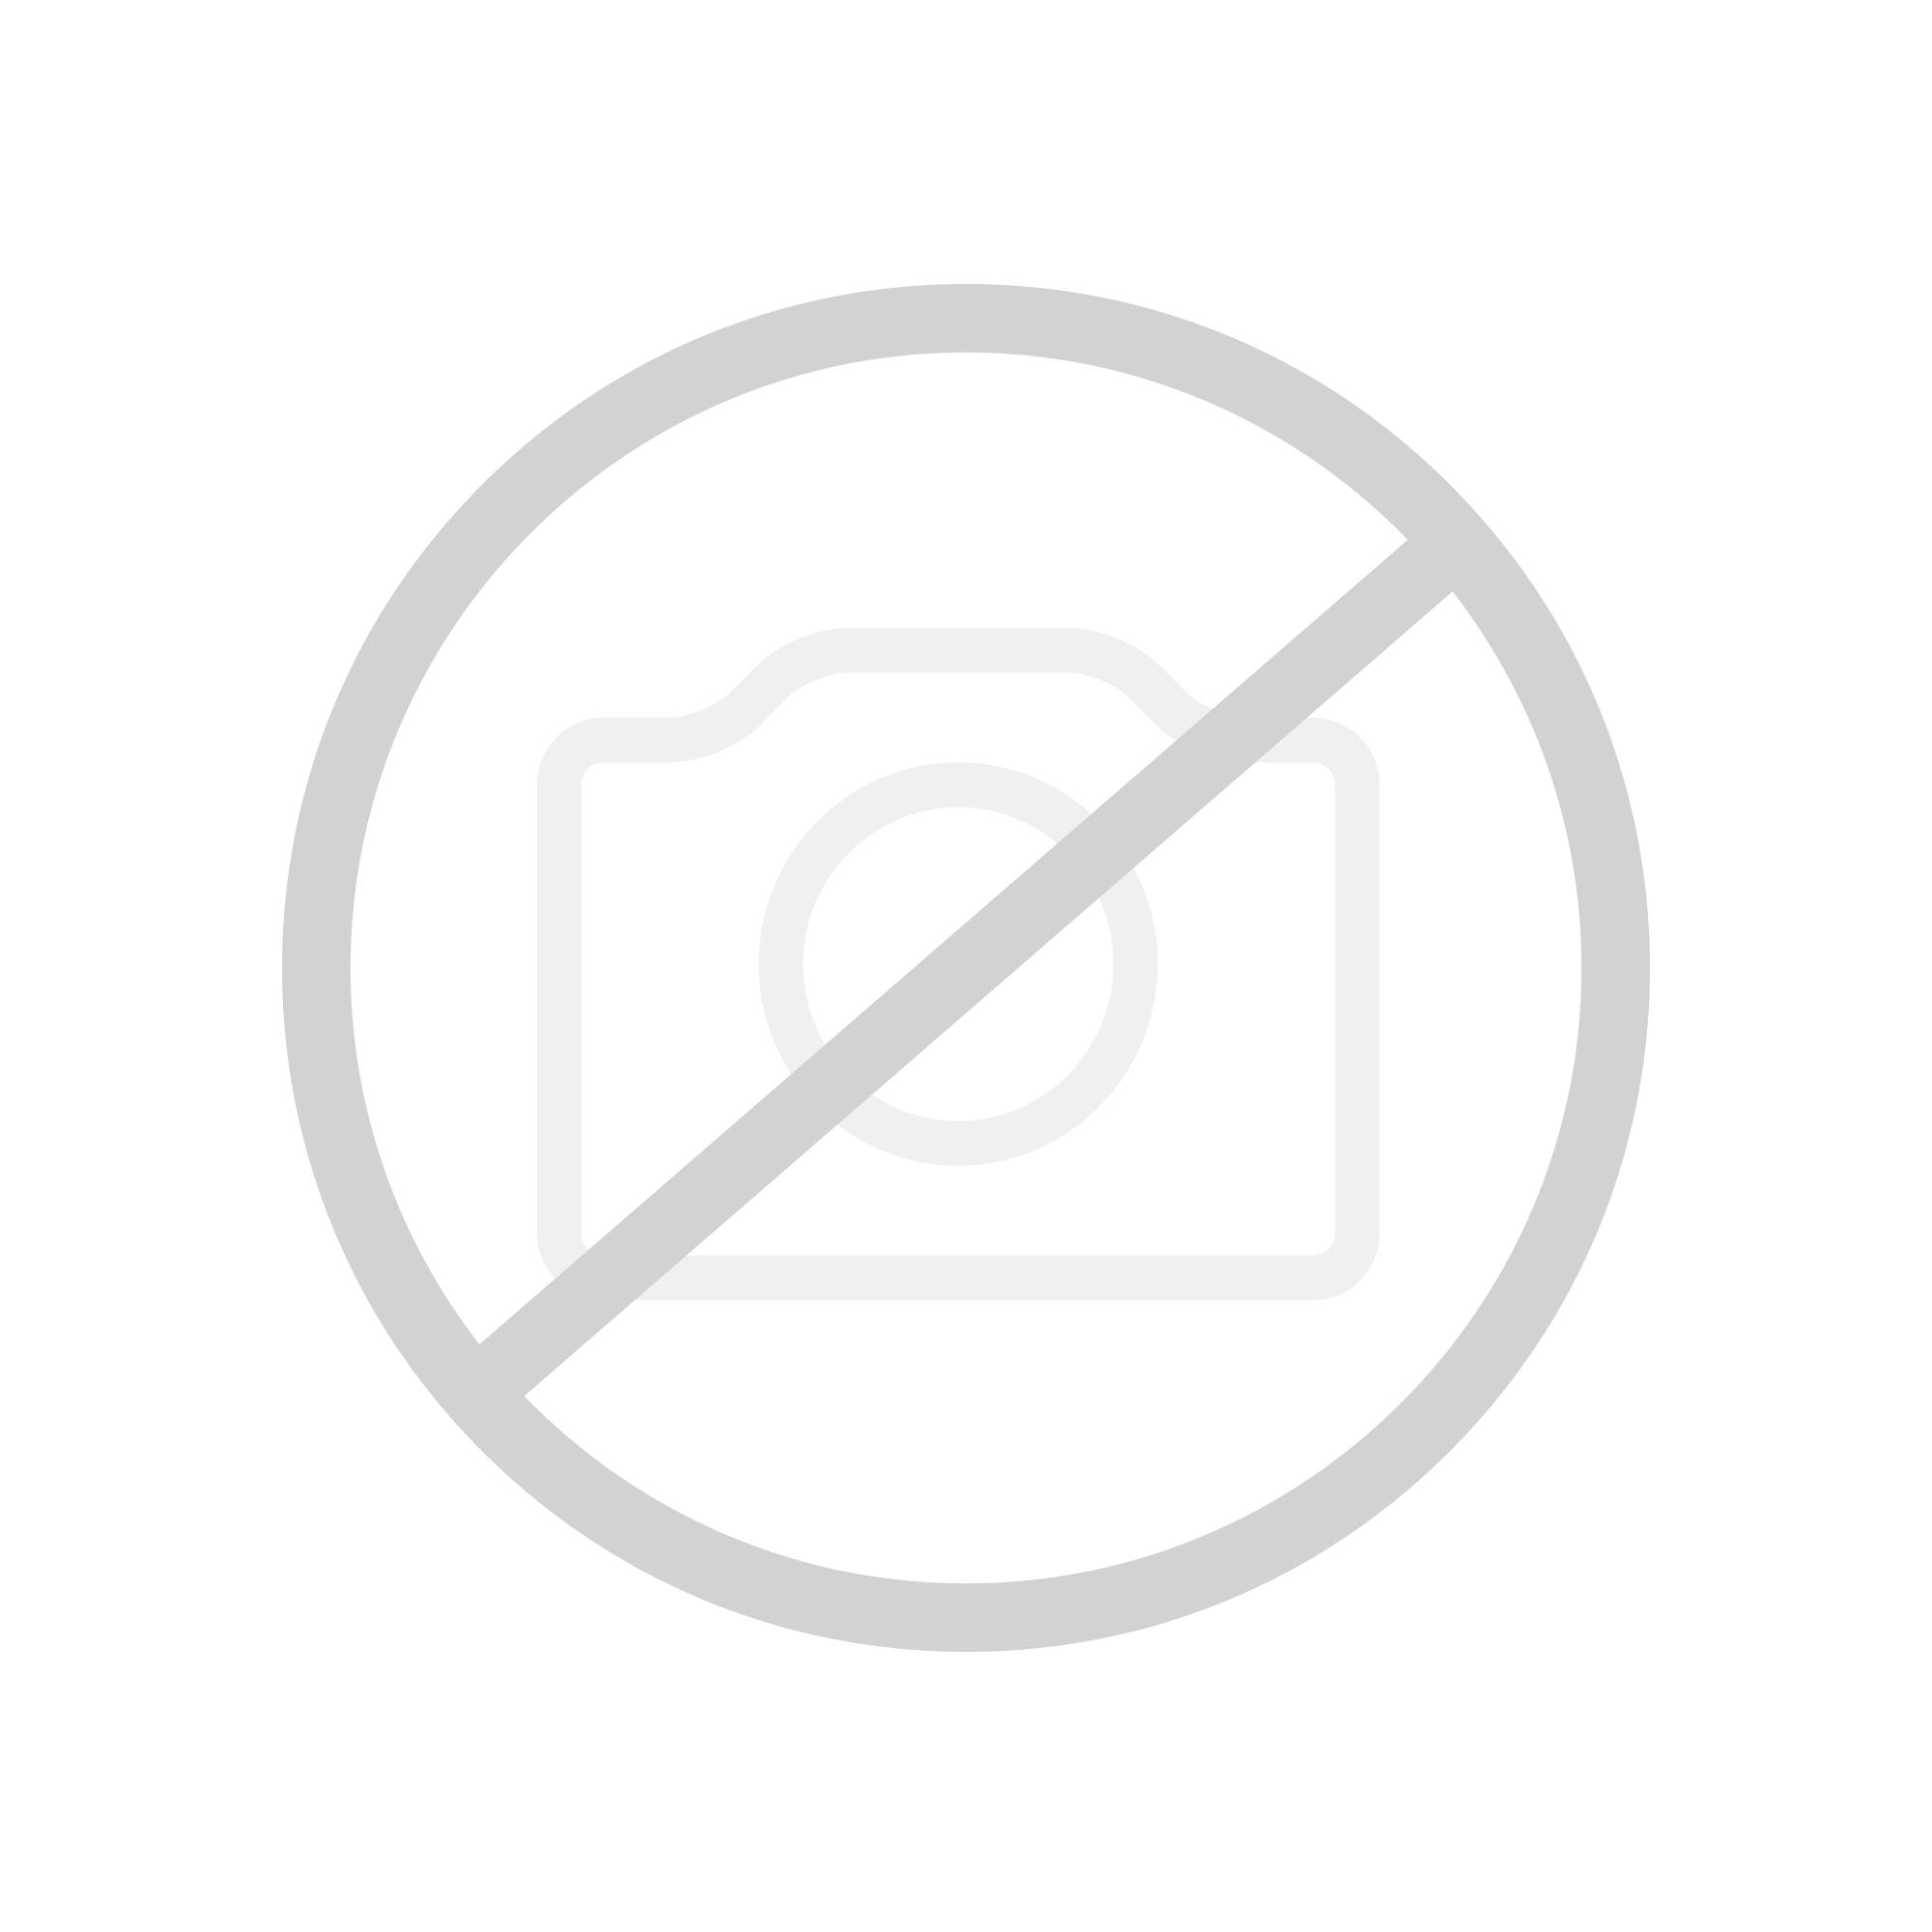 Hoesch LARGO Rechteck Whirlwanne L: 180 B: 80 H: 48 cm, mit Deluxe Whirl-Air Whirlsystem